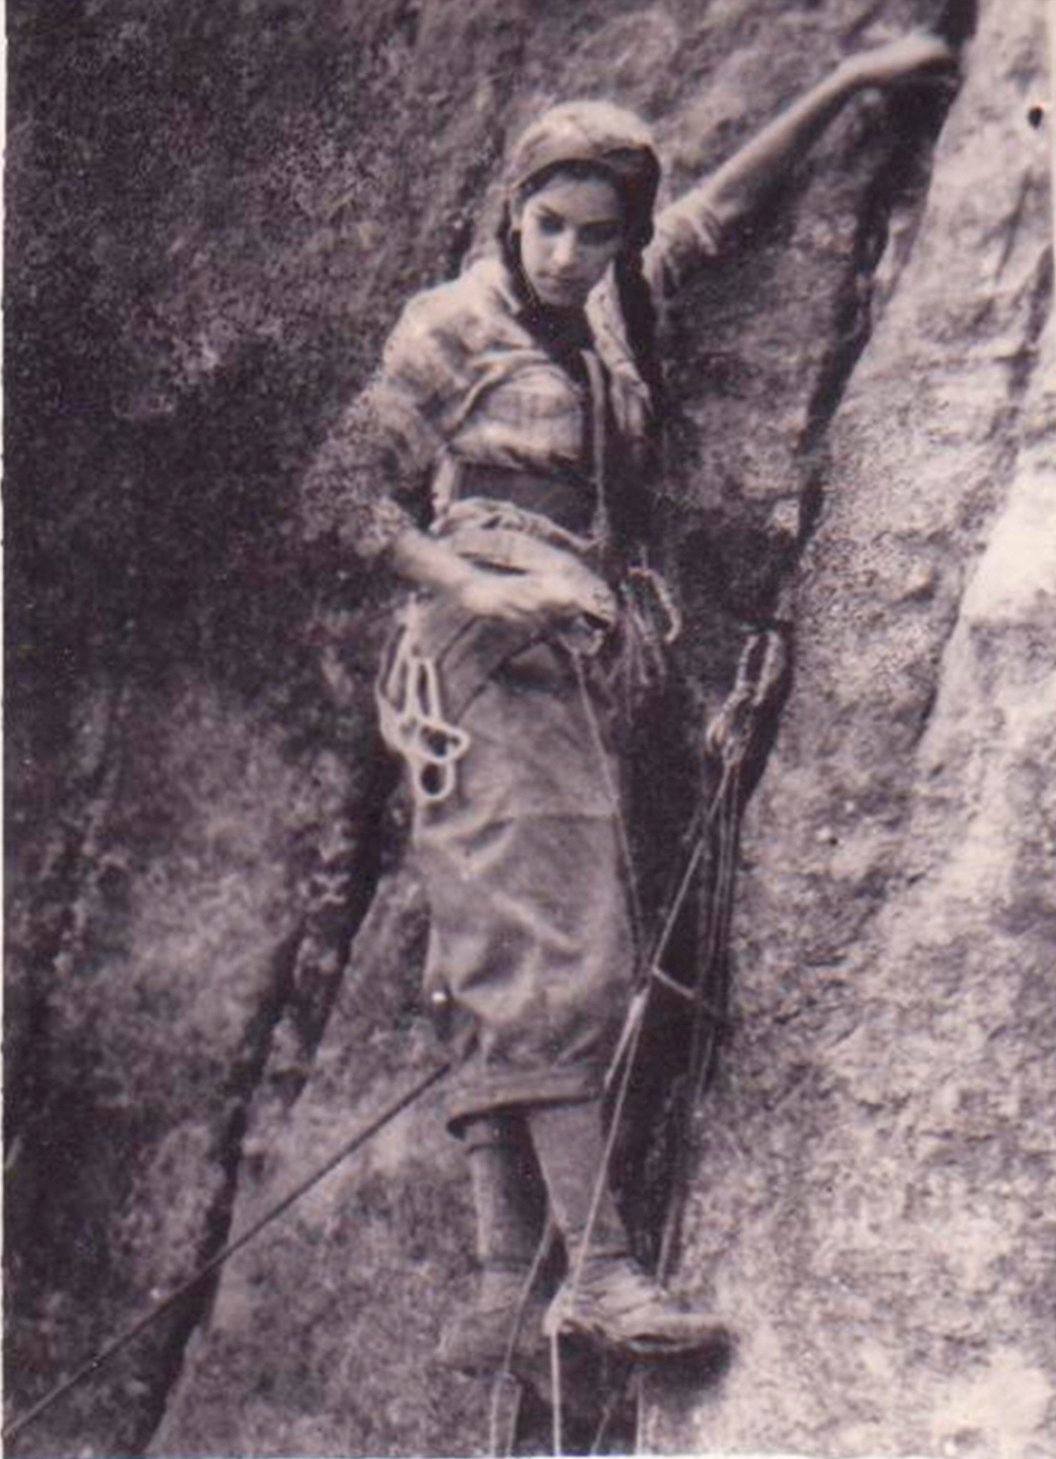 Sexy Women Climbers